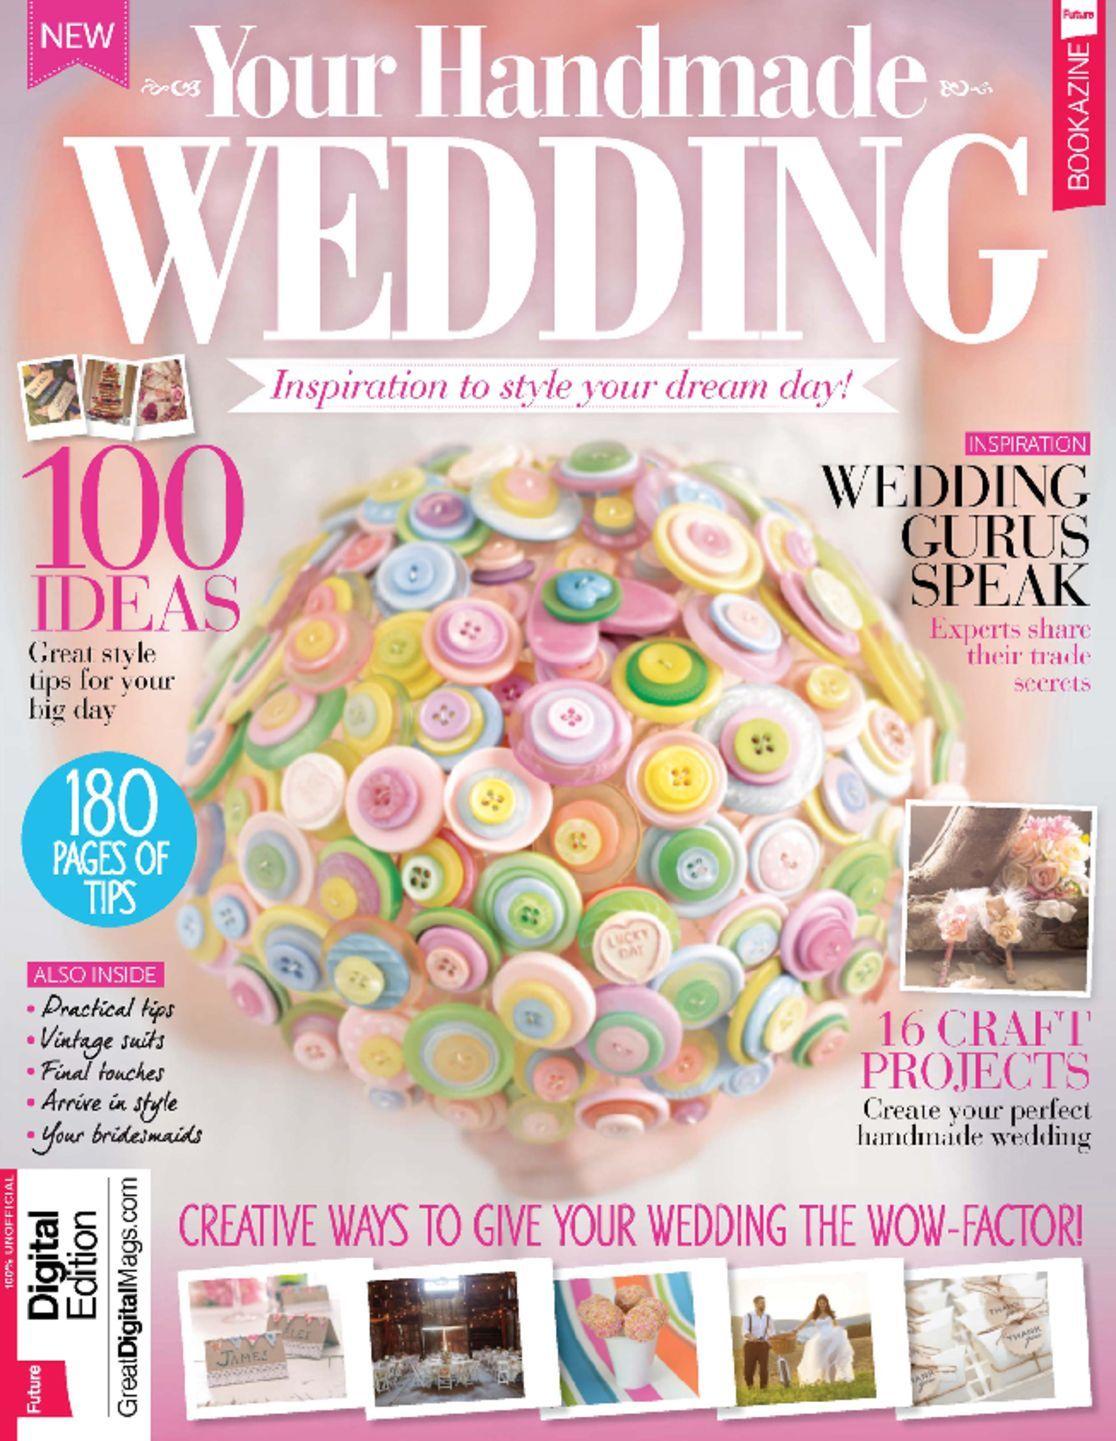 Your Handmade Wedding Digital